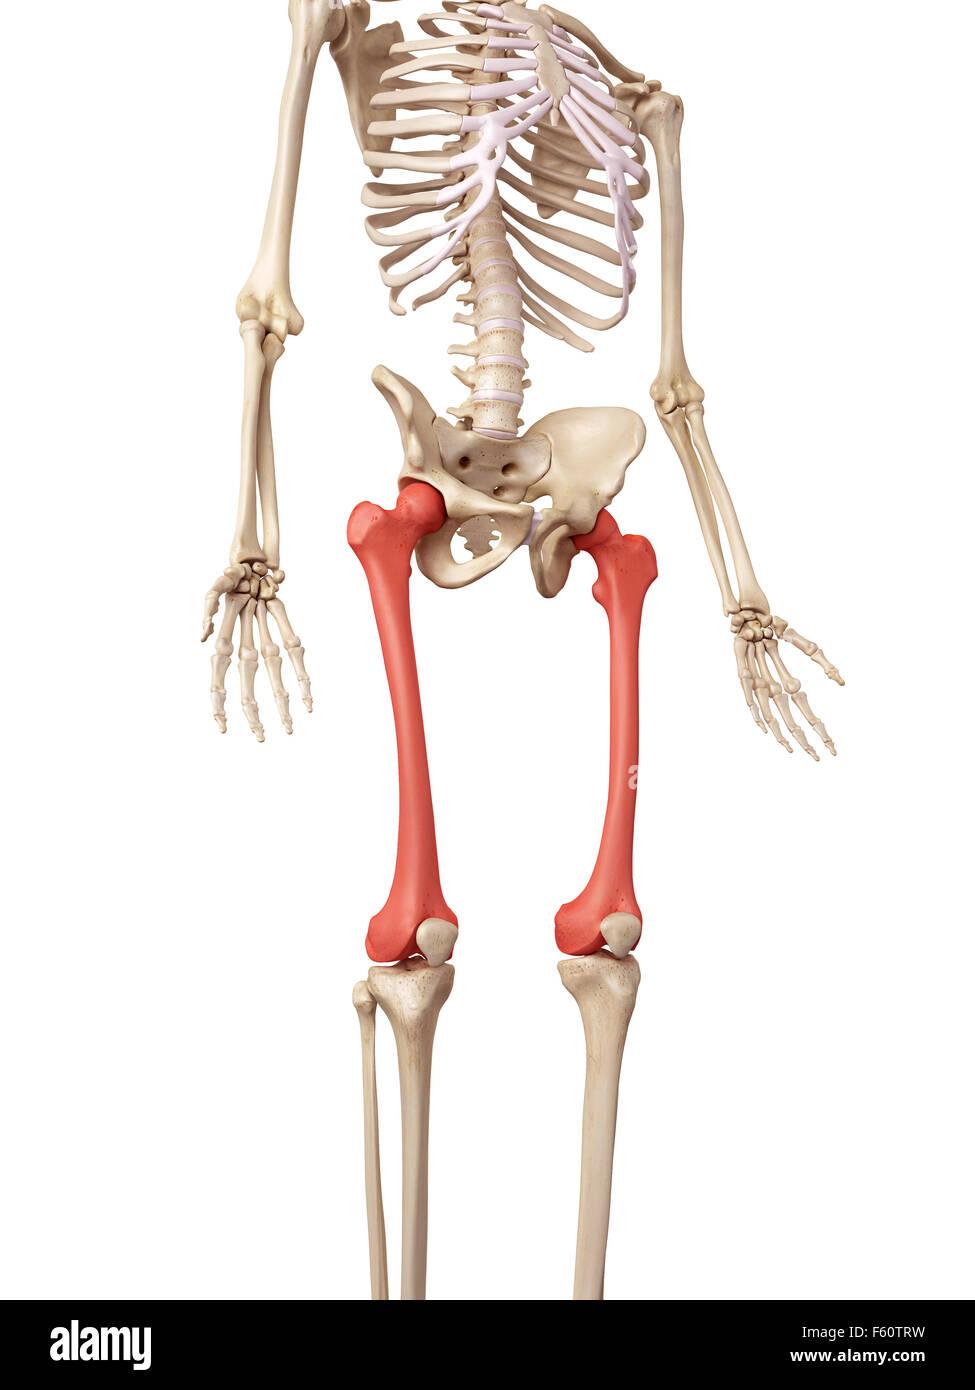 Human Femur Bone Stock Photos & Human Femur Bone Stock Images - Alamy